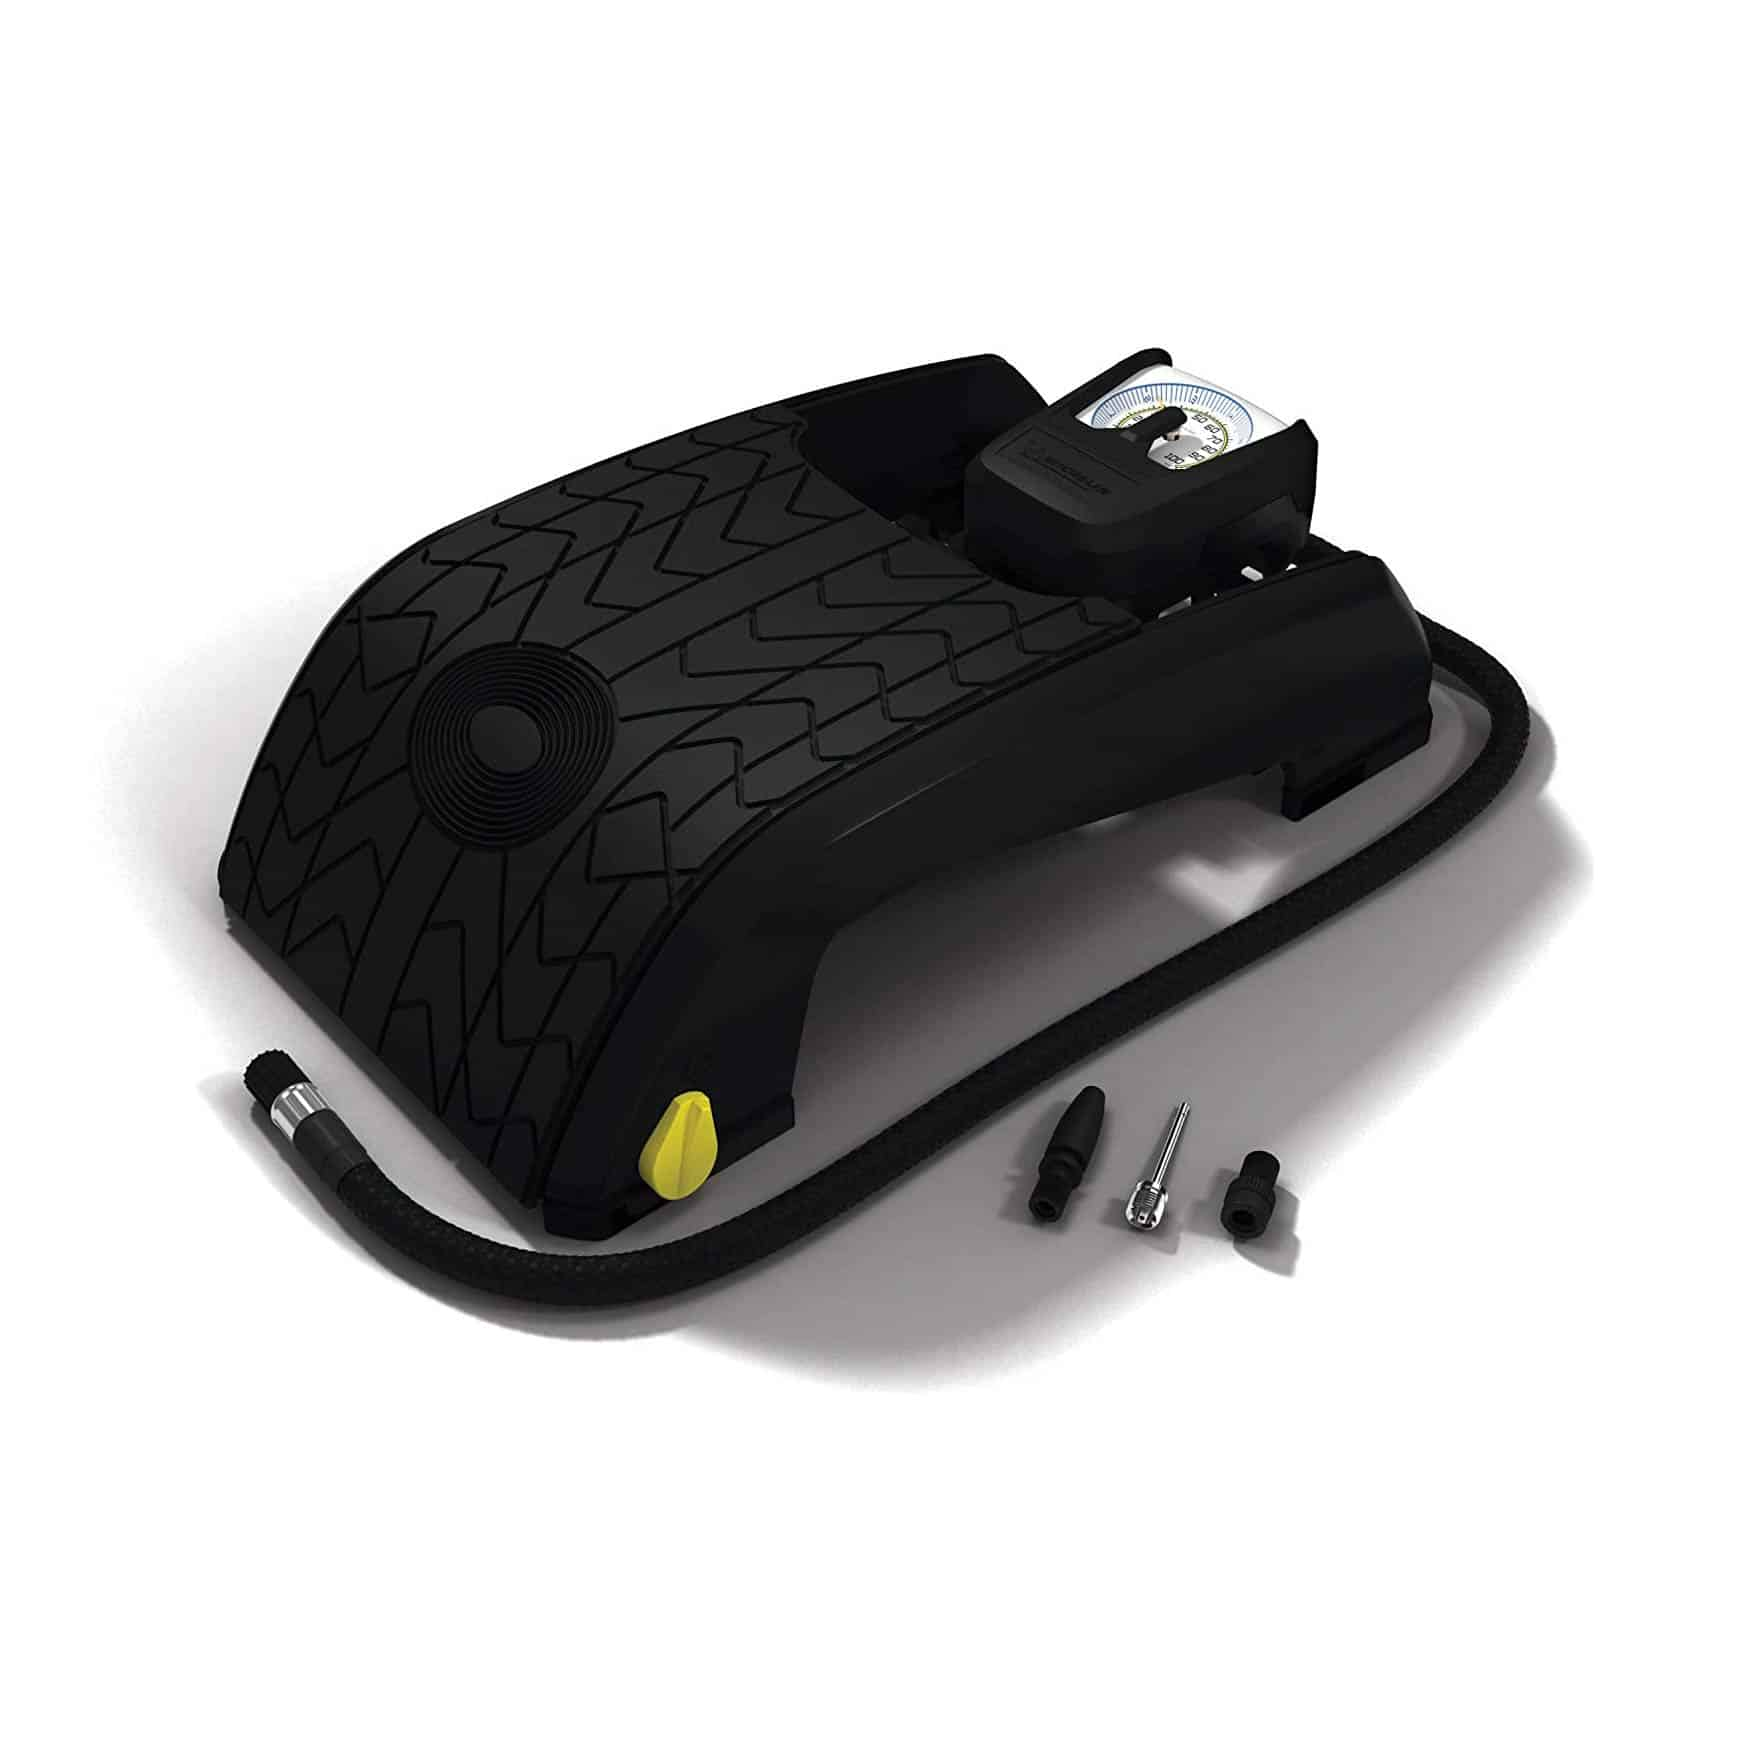 Michelin Analogue Double Barrel Foot Pump 12206